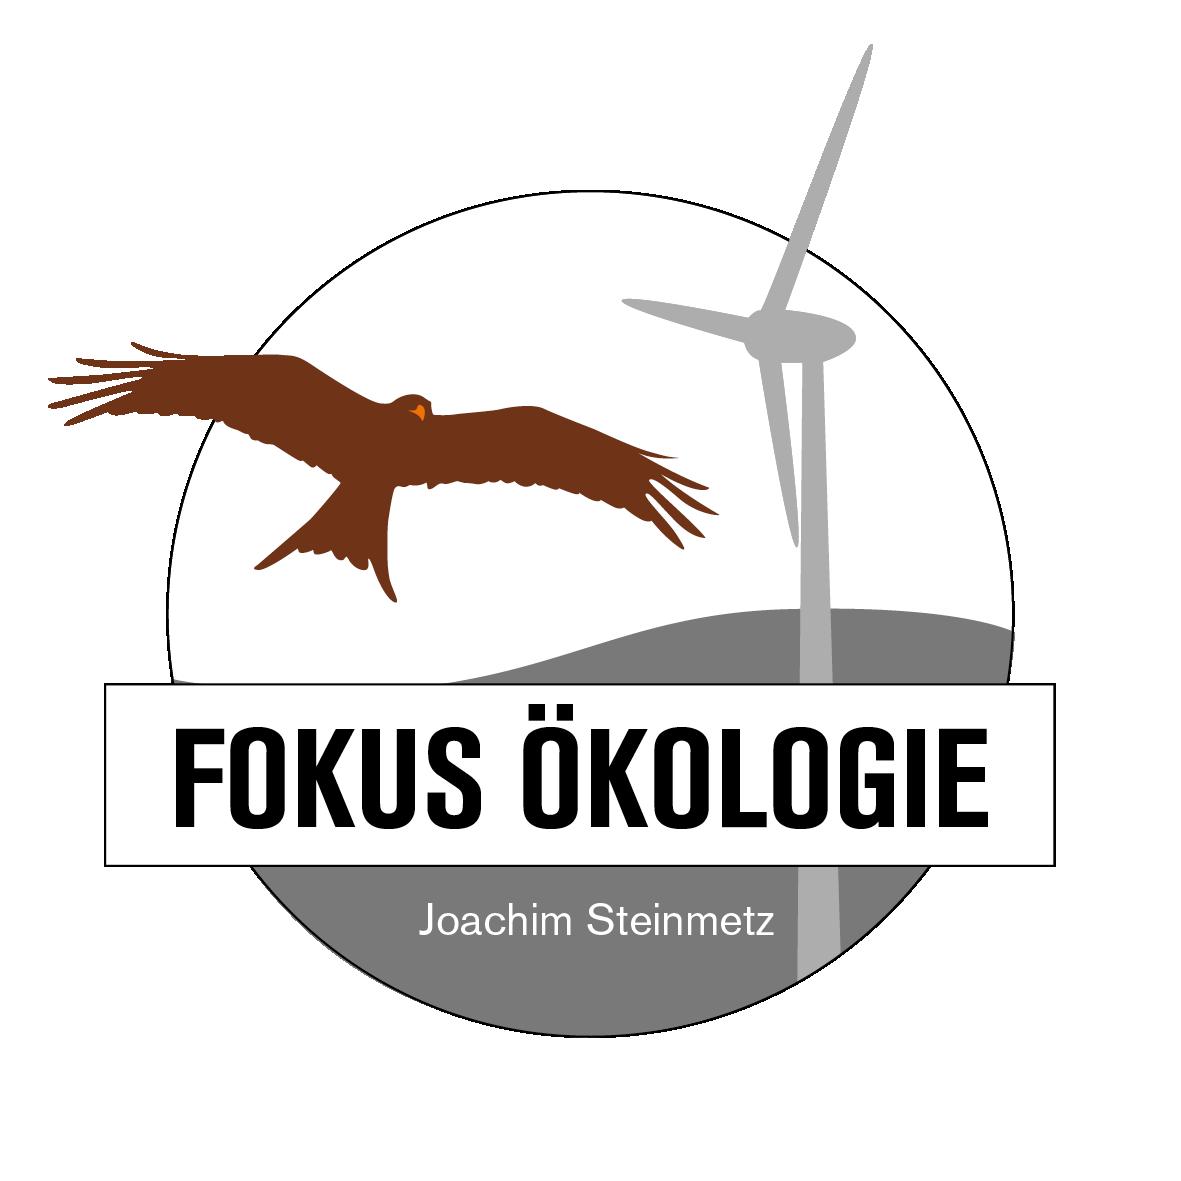 Fokus Ökologie